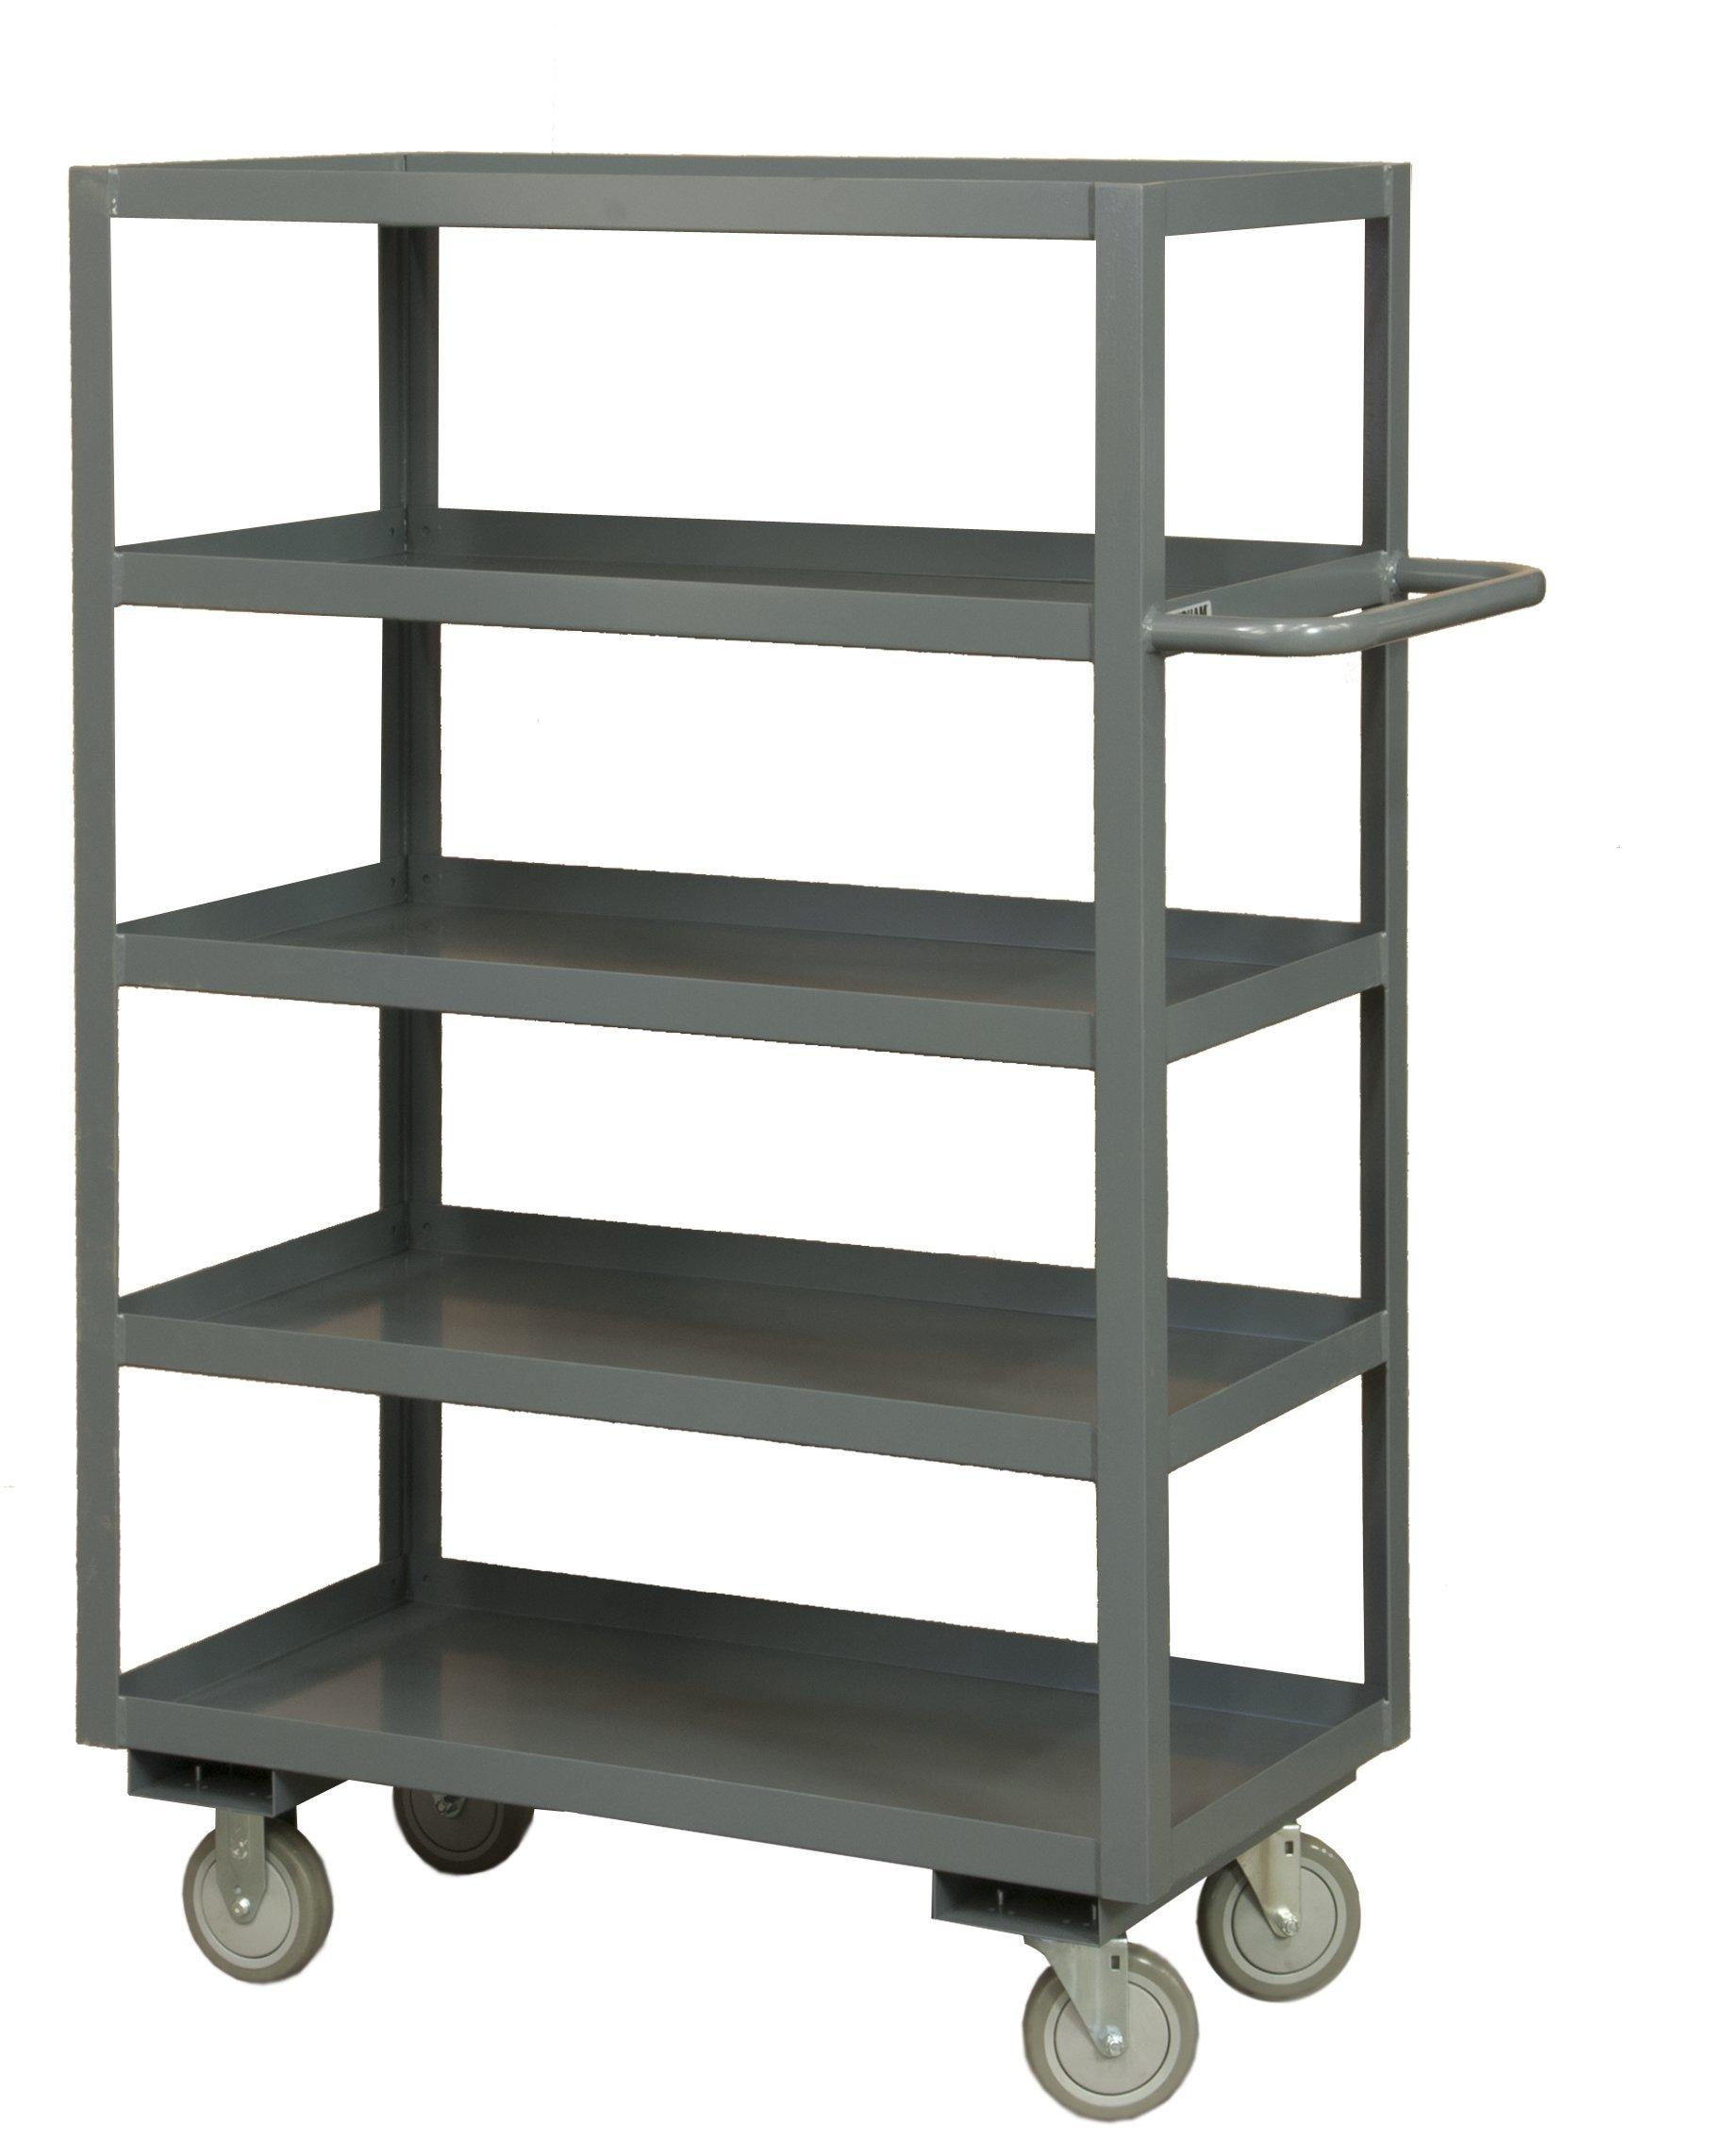 Durham 14 Gauge Steel Rolling Service Stock Cart, RSC-2436-5-95,  1200 lbs Capacity,5 Shelves